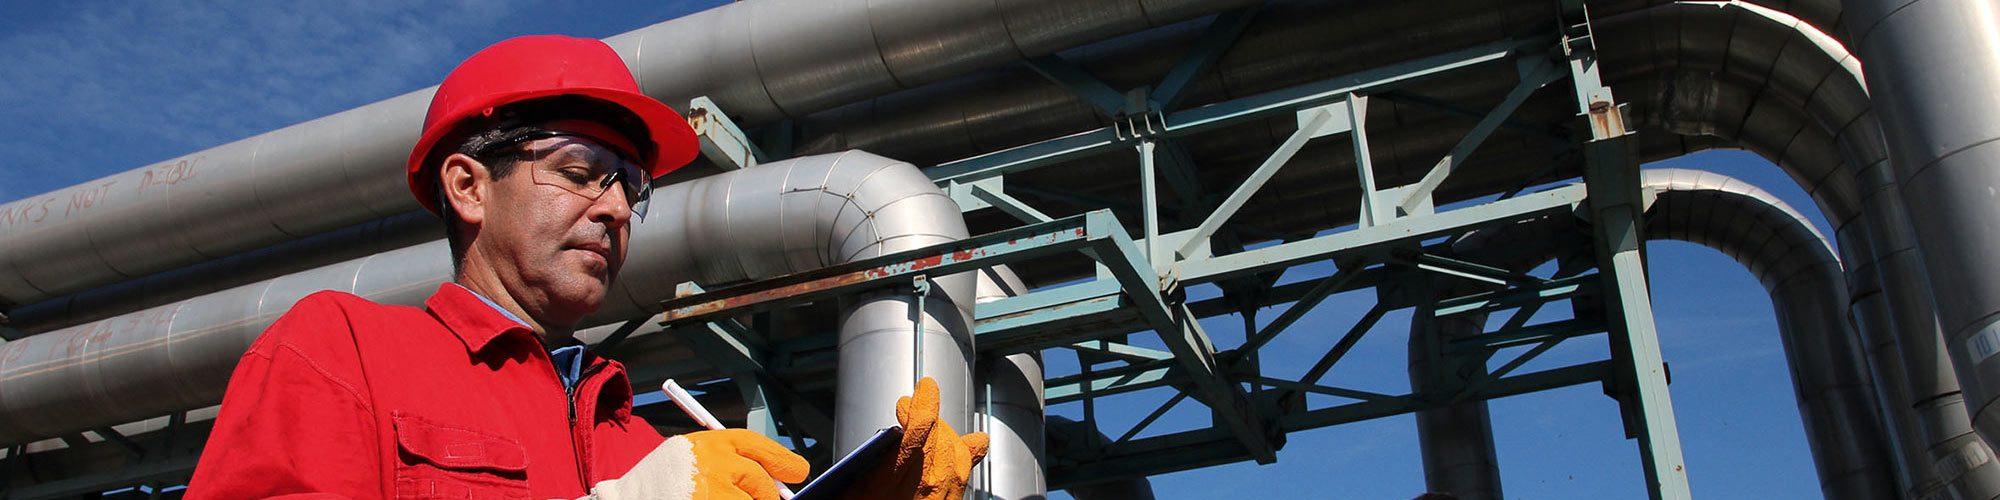 Preventive maintenance and retrofit